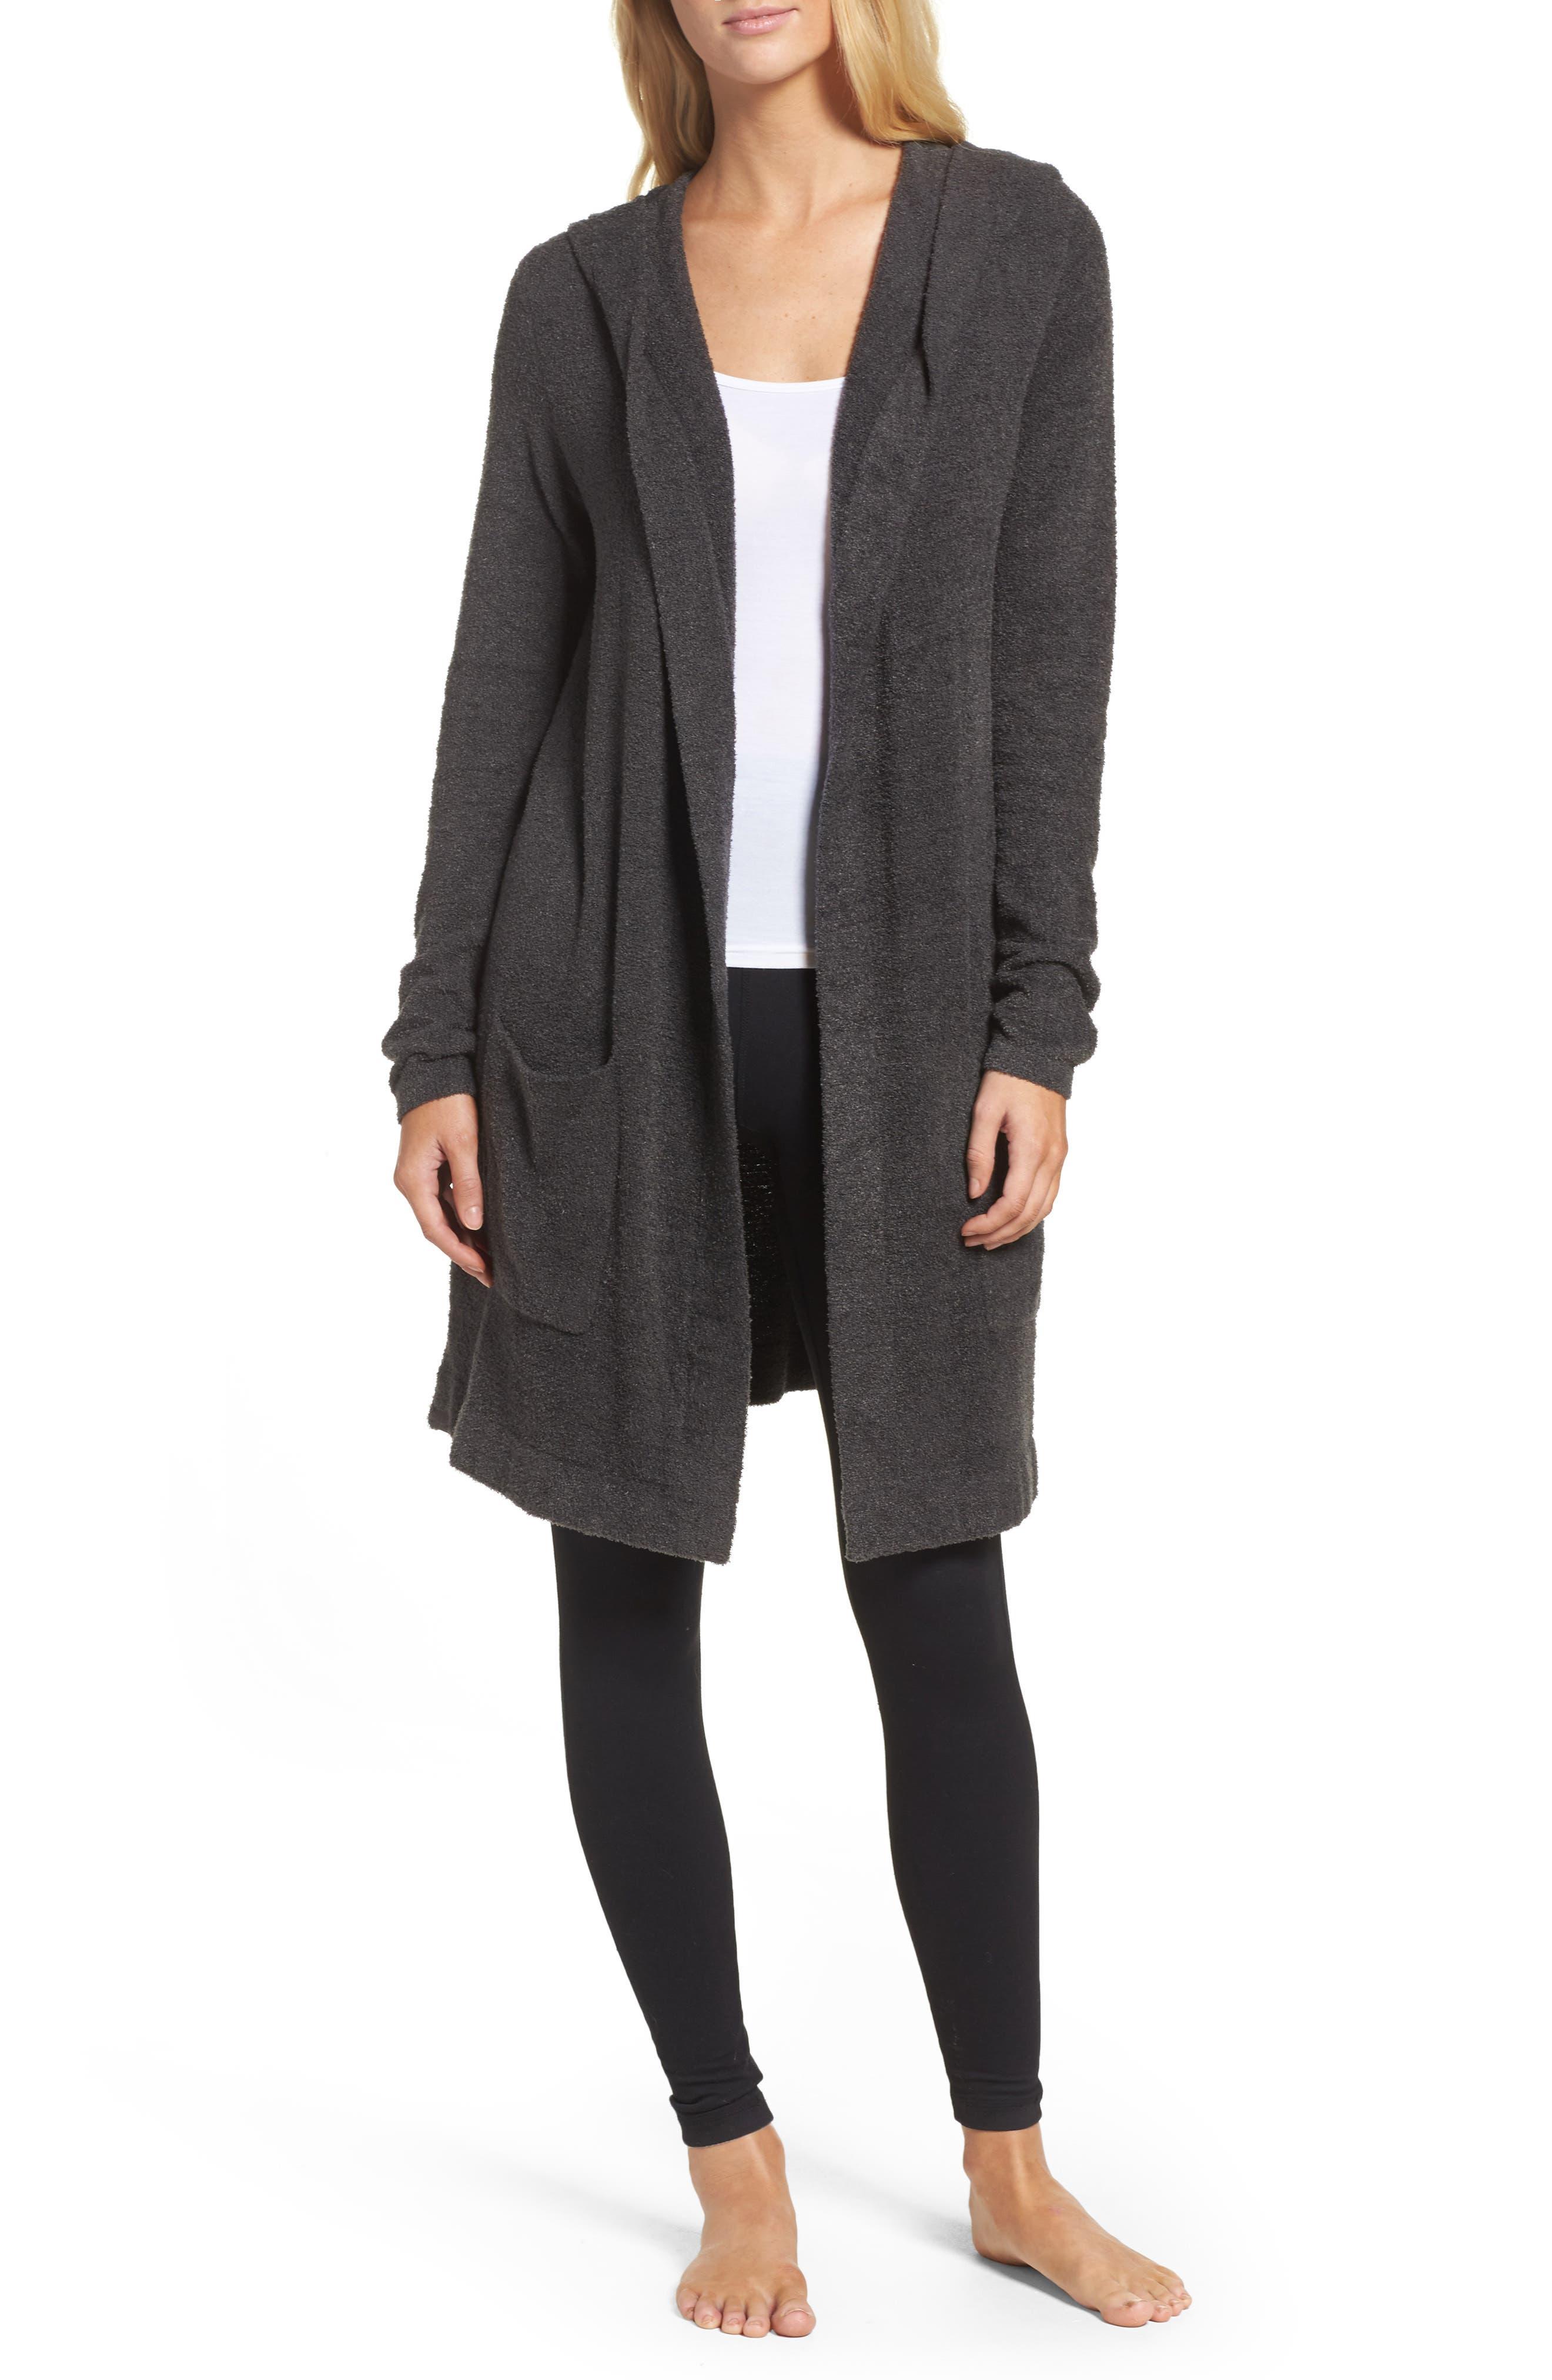 Barefoot Dreams® Cozychic Lite® Coastal Hooded Cardigan